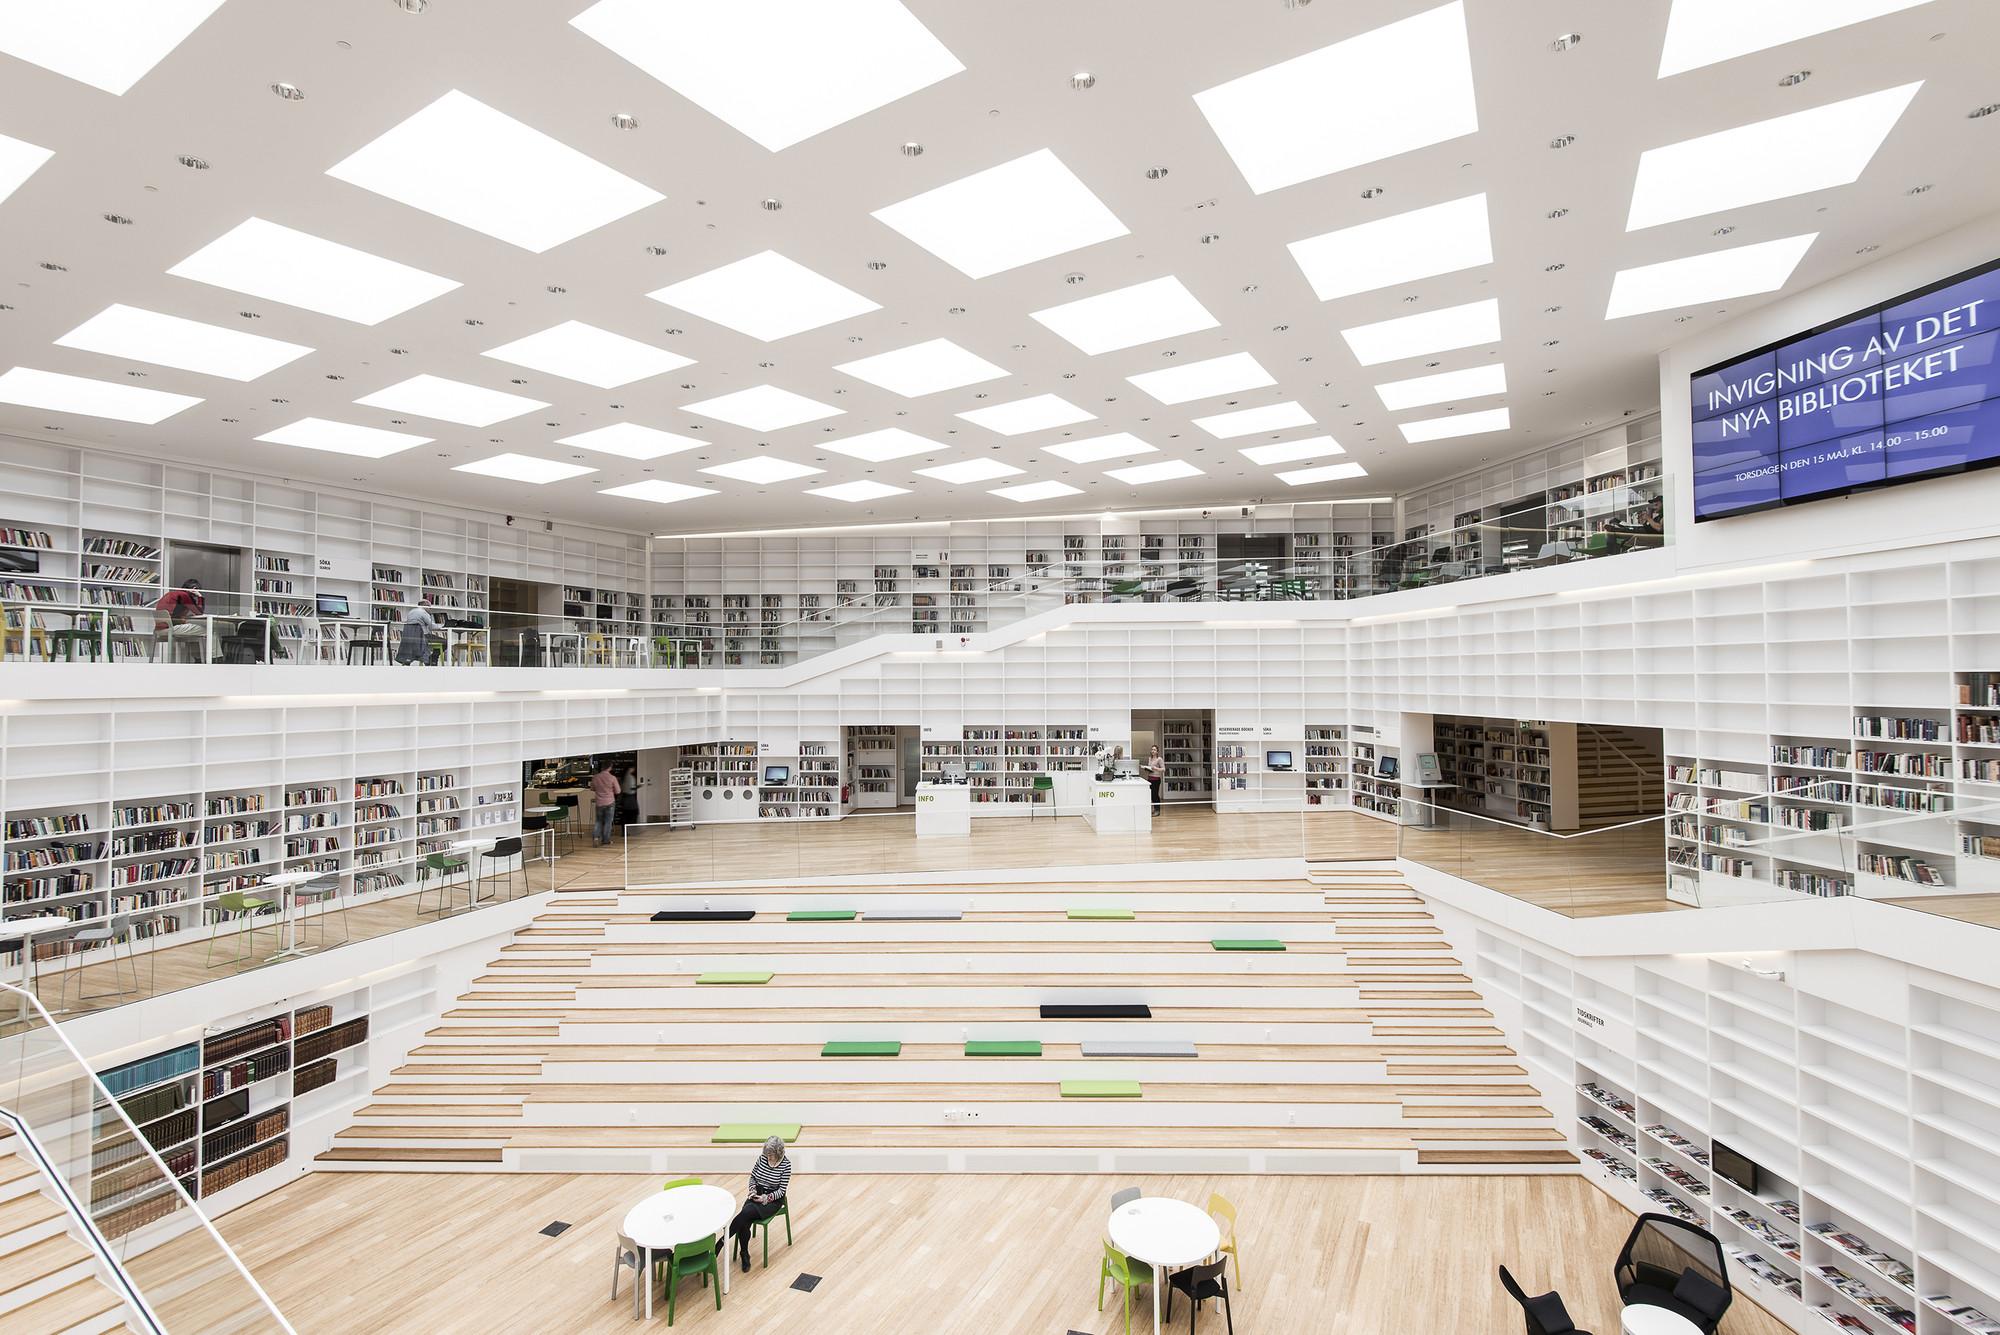 Dalarna Media Library / ADEPT, © Wilhelm Rejnus & Linus Flodin